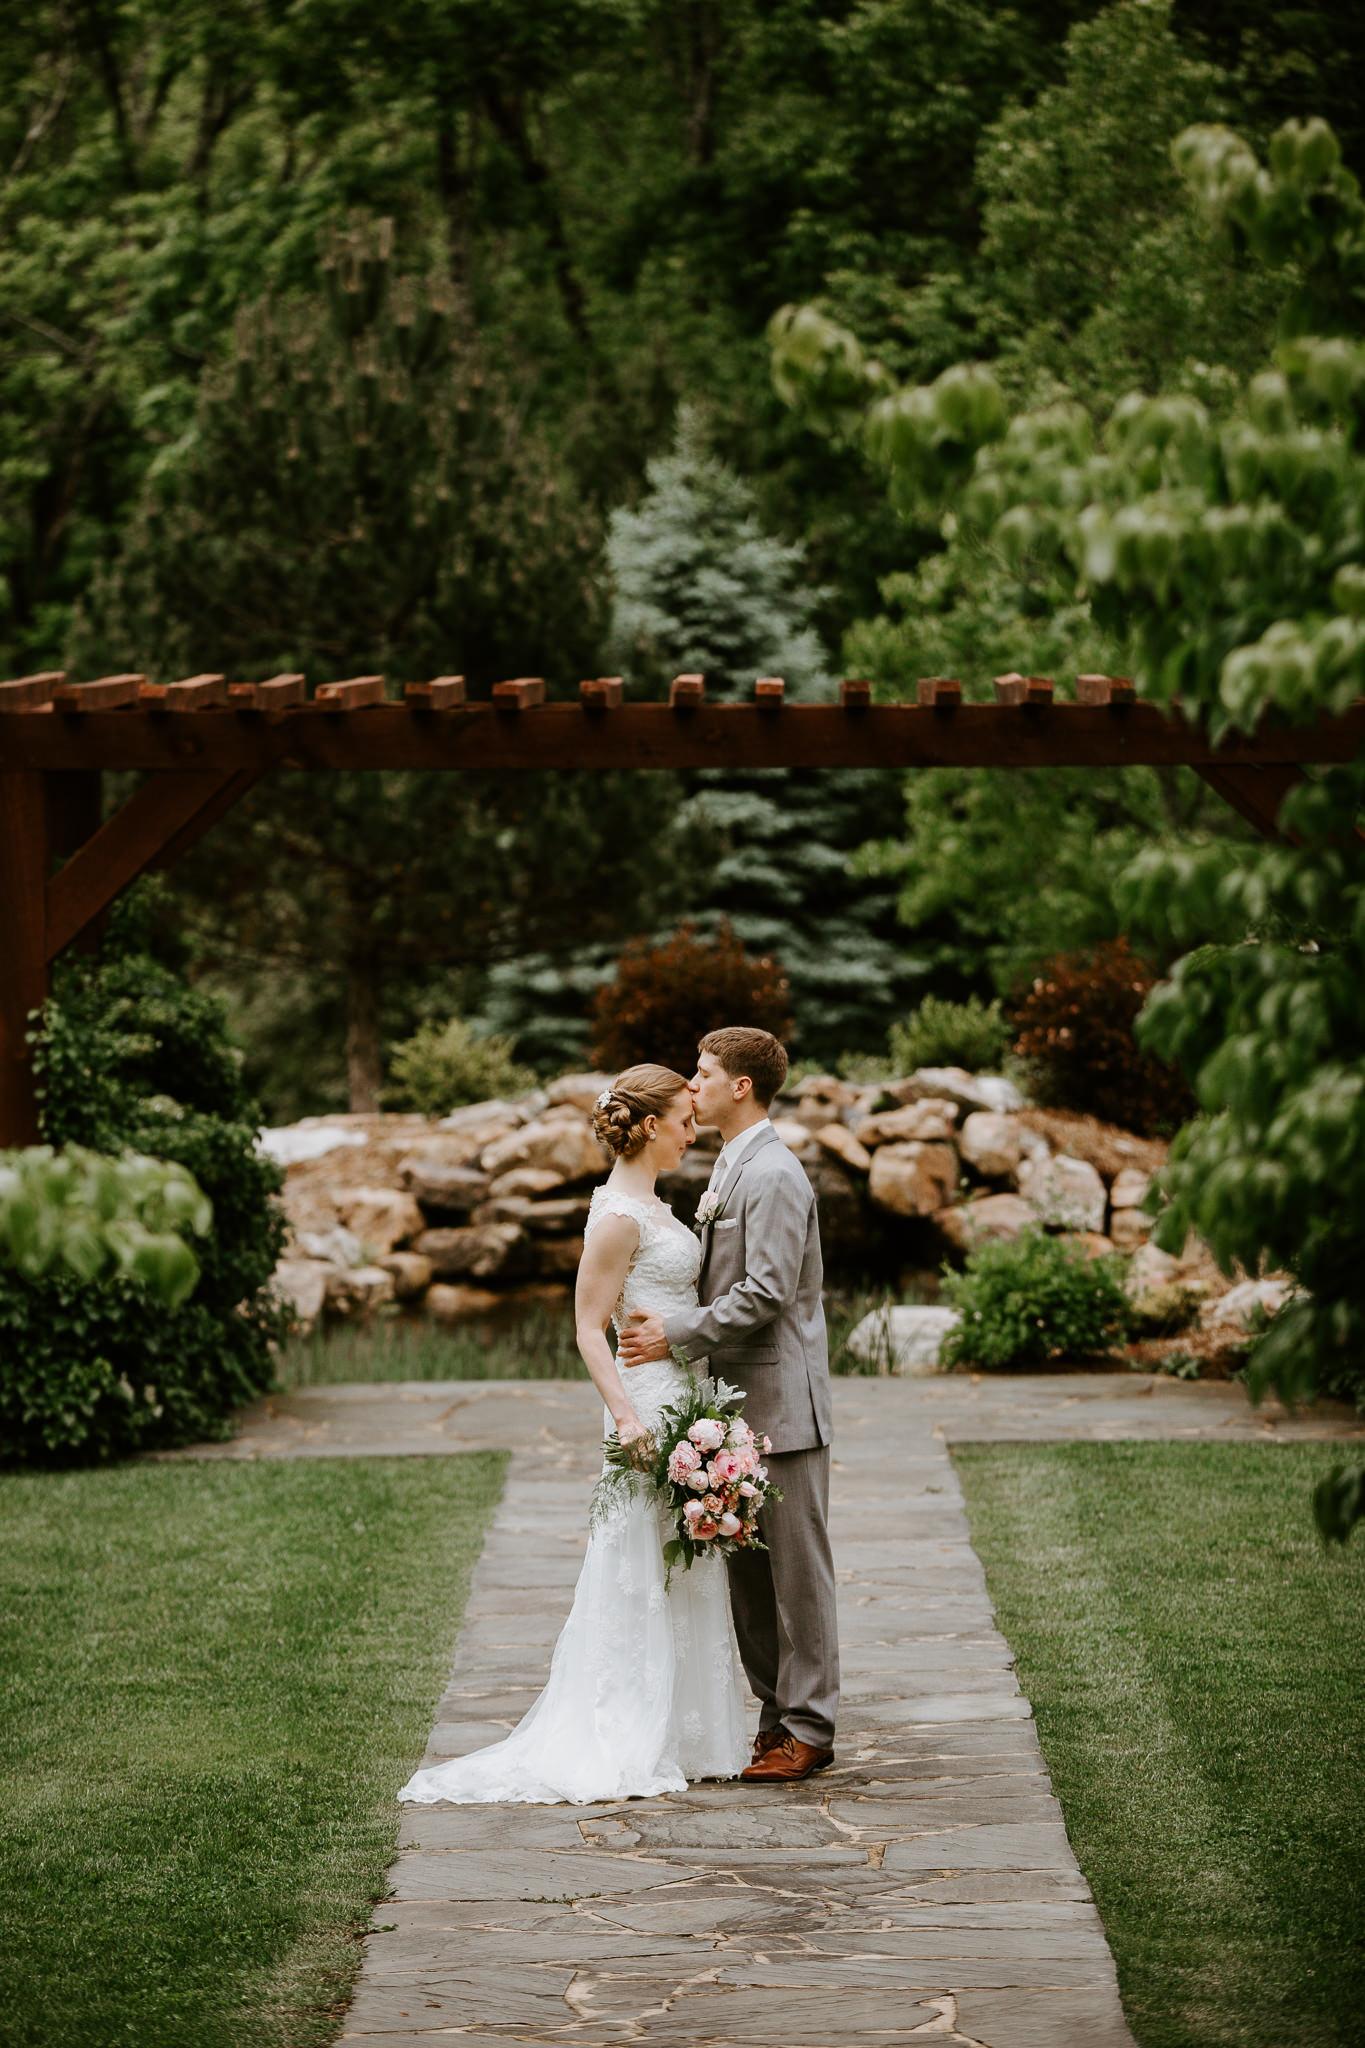 House Mountain Inn - Weddings - Lexington - Virginia - Best Wedding Photographer - Pat Cori Photography-32.jpg